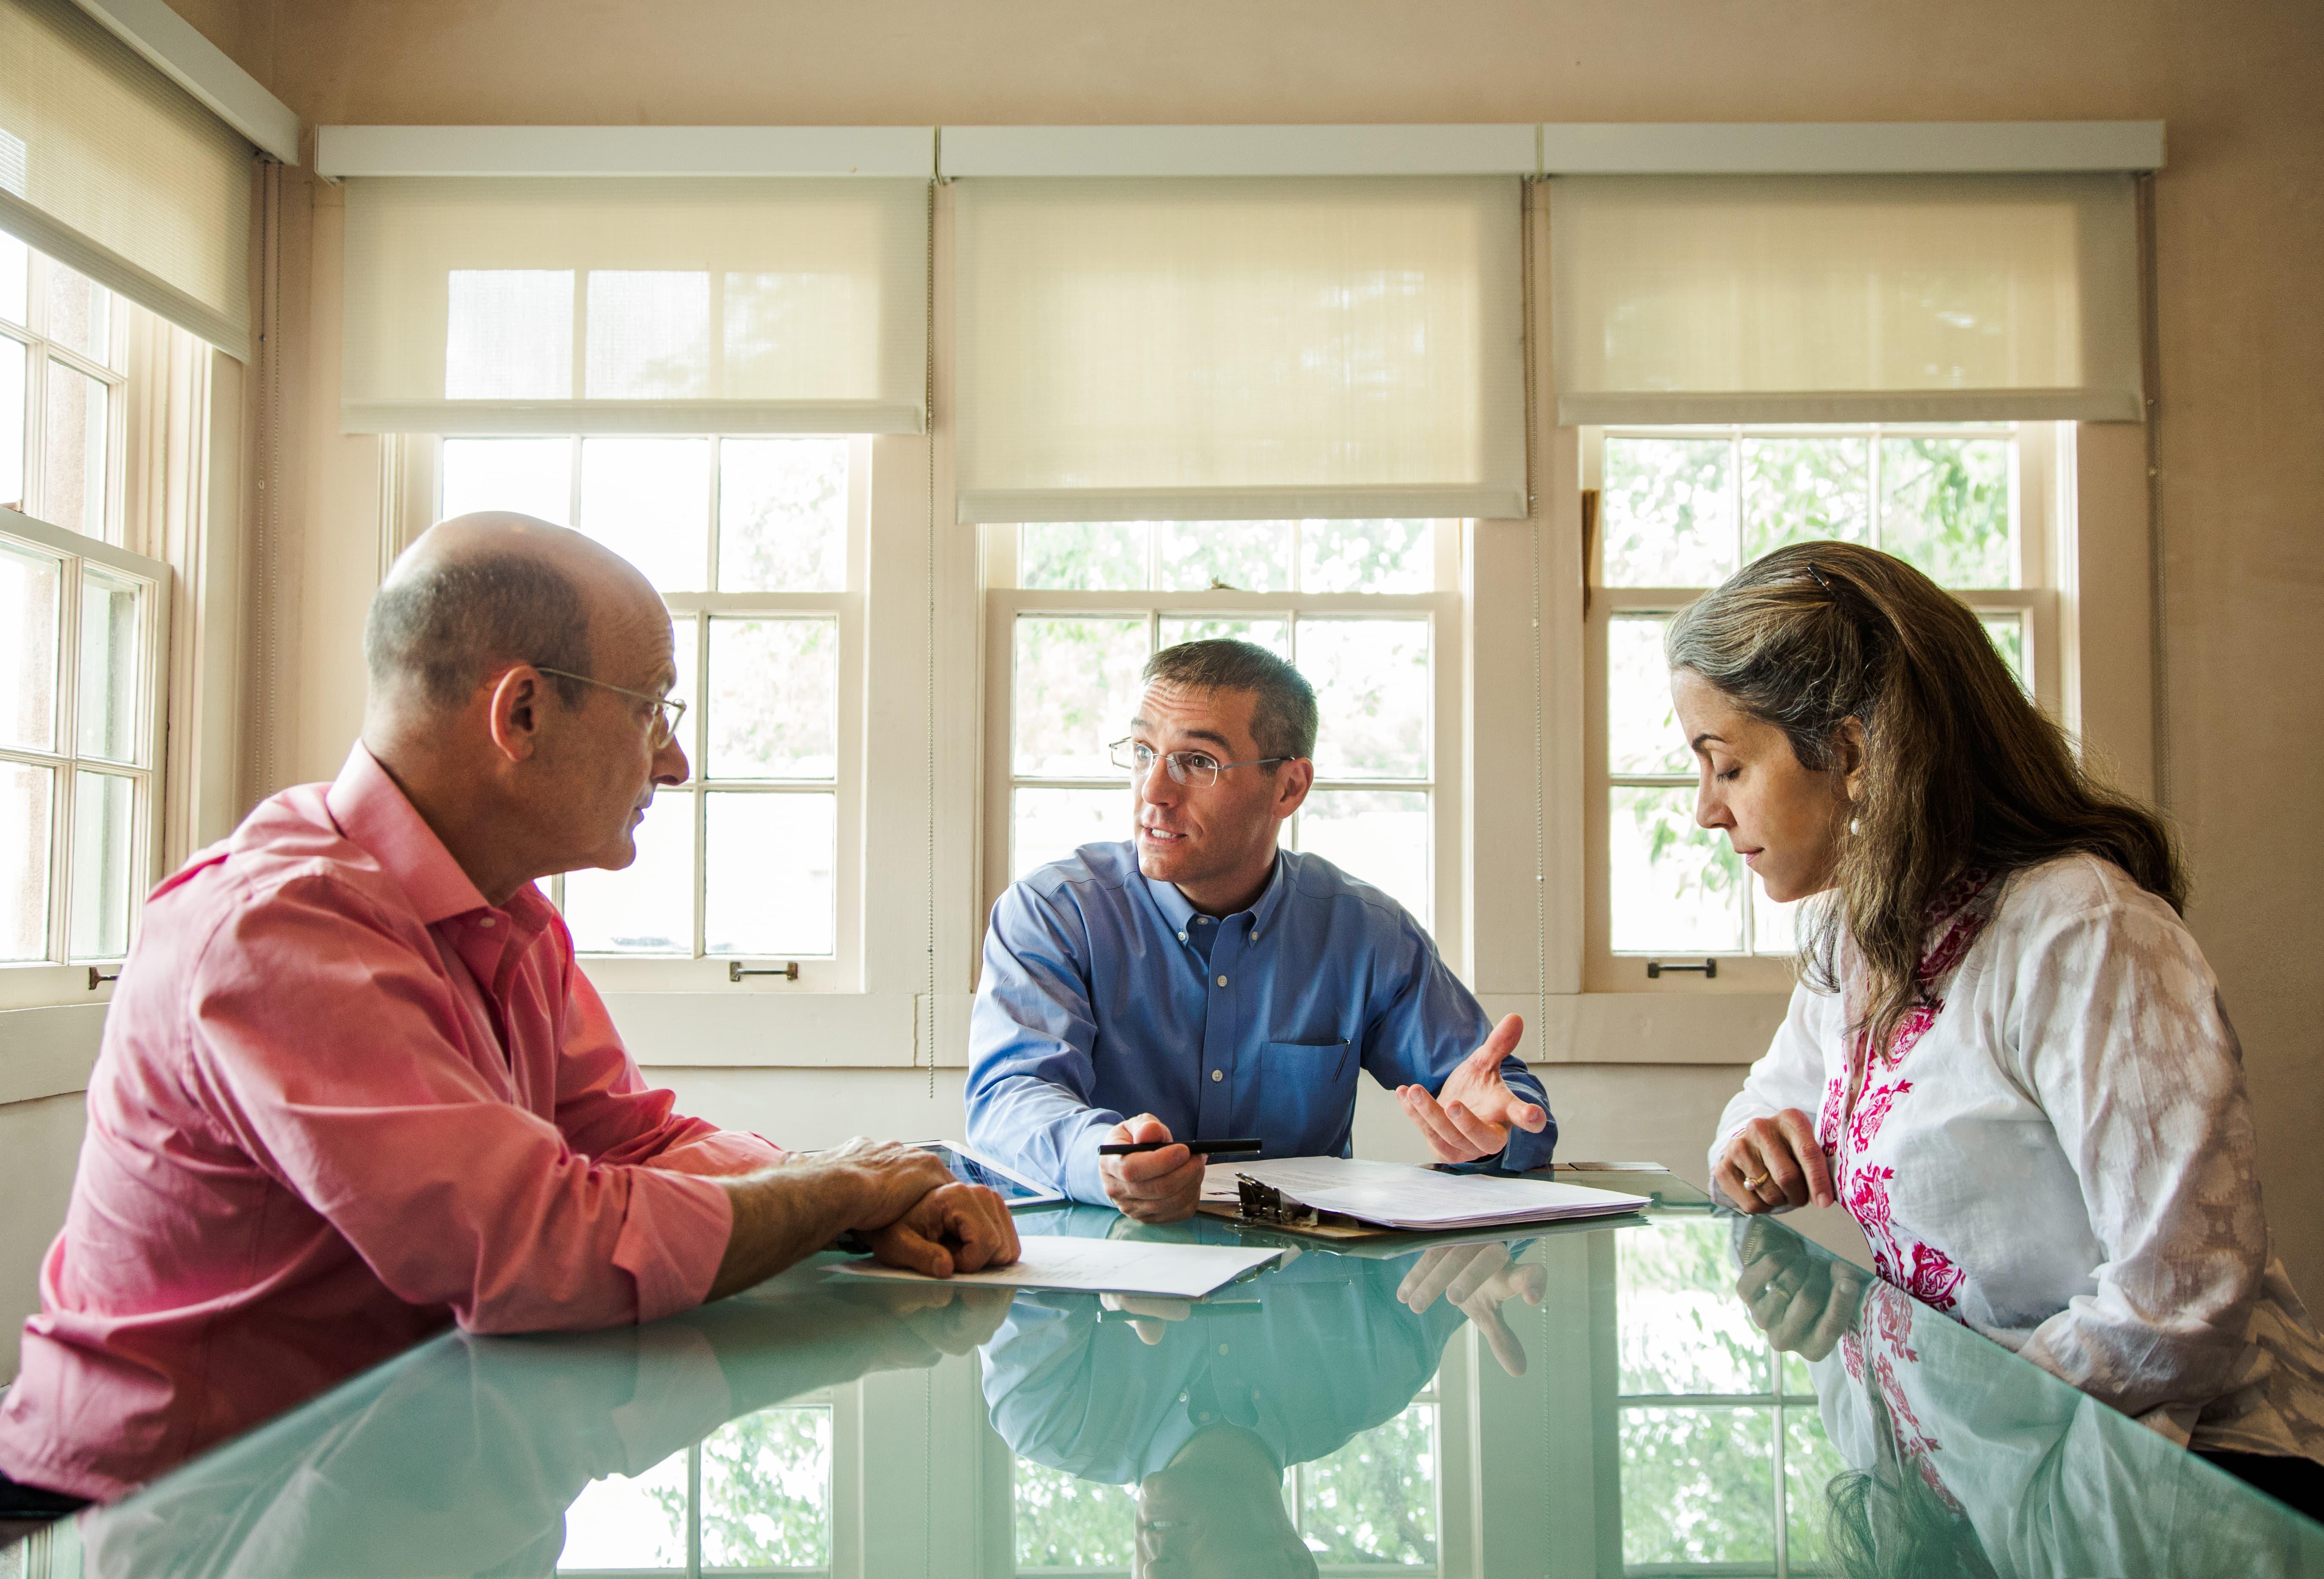 Financial Planning Santa Fe, New Mexico LongView Asset Management